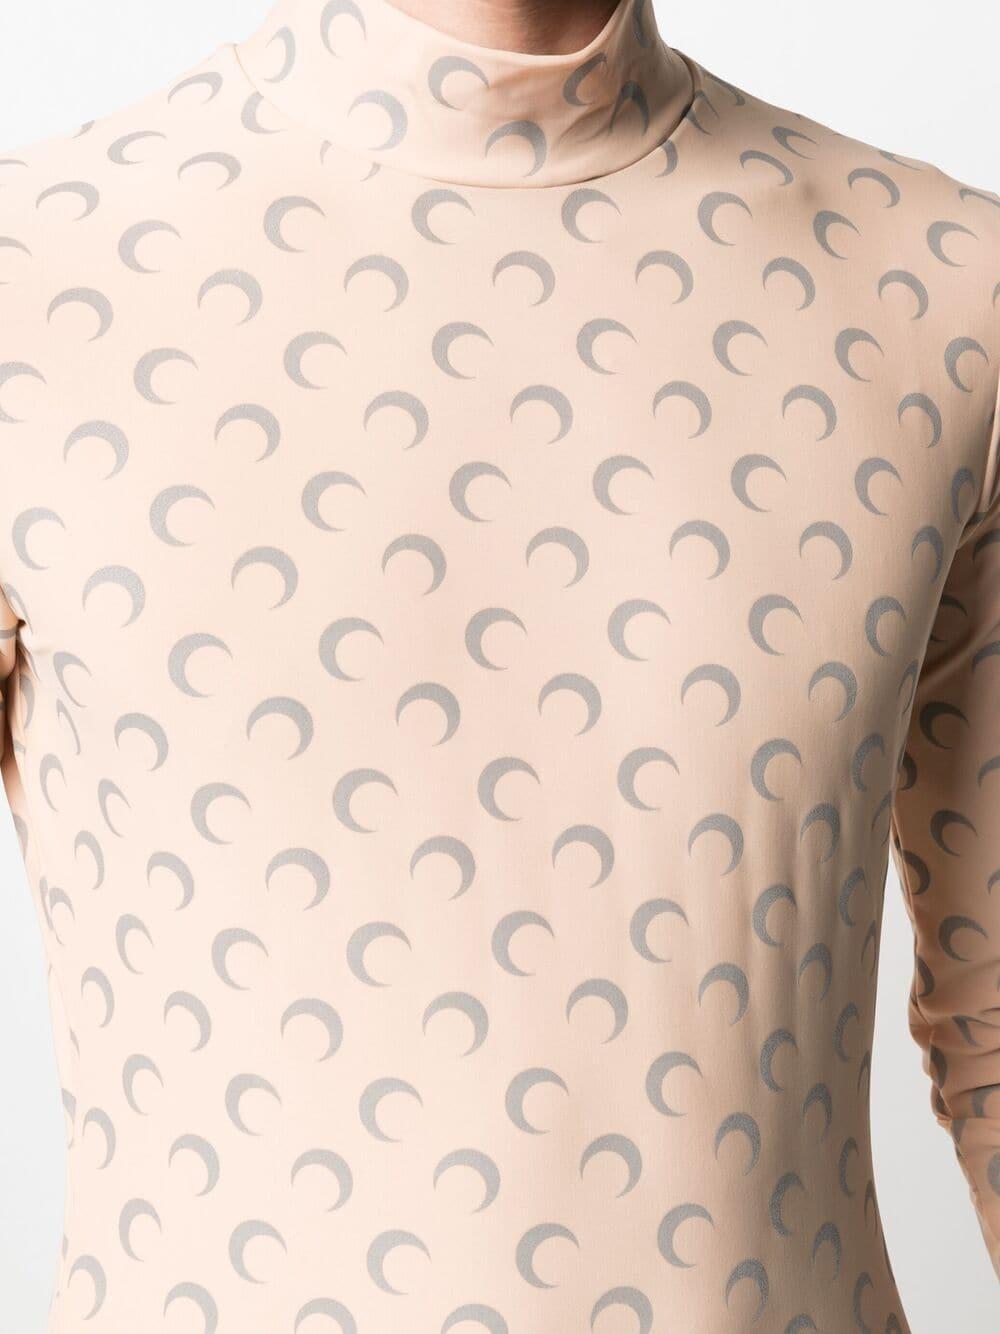 Top Con Stampa Mezzaluna Unisex MARINE SERRE | T-shirt | T088SS21M-JERPL000948-09